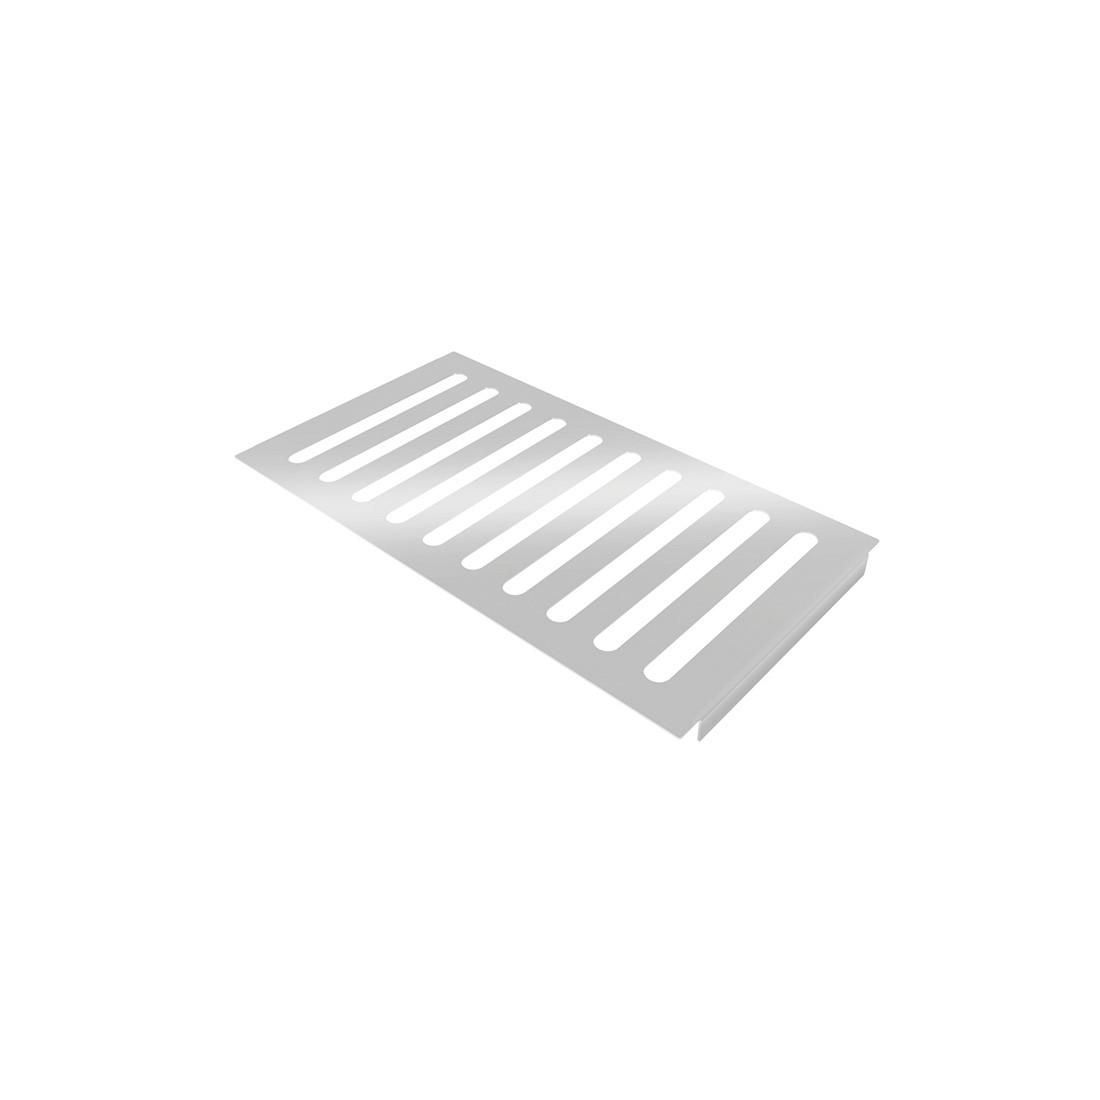 Escorredor Raso Debacco Inox 30cm - 20.04.00116